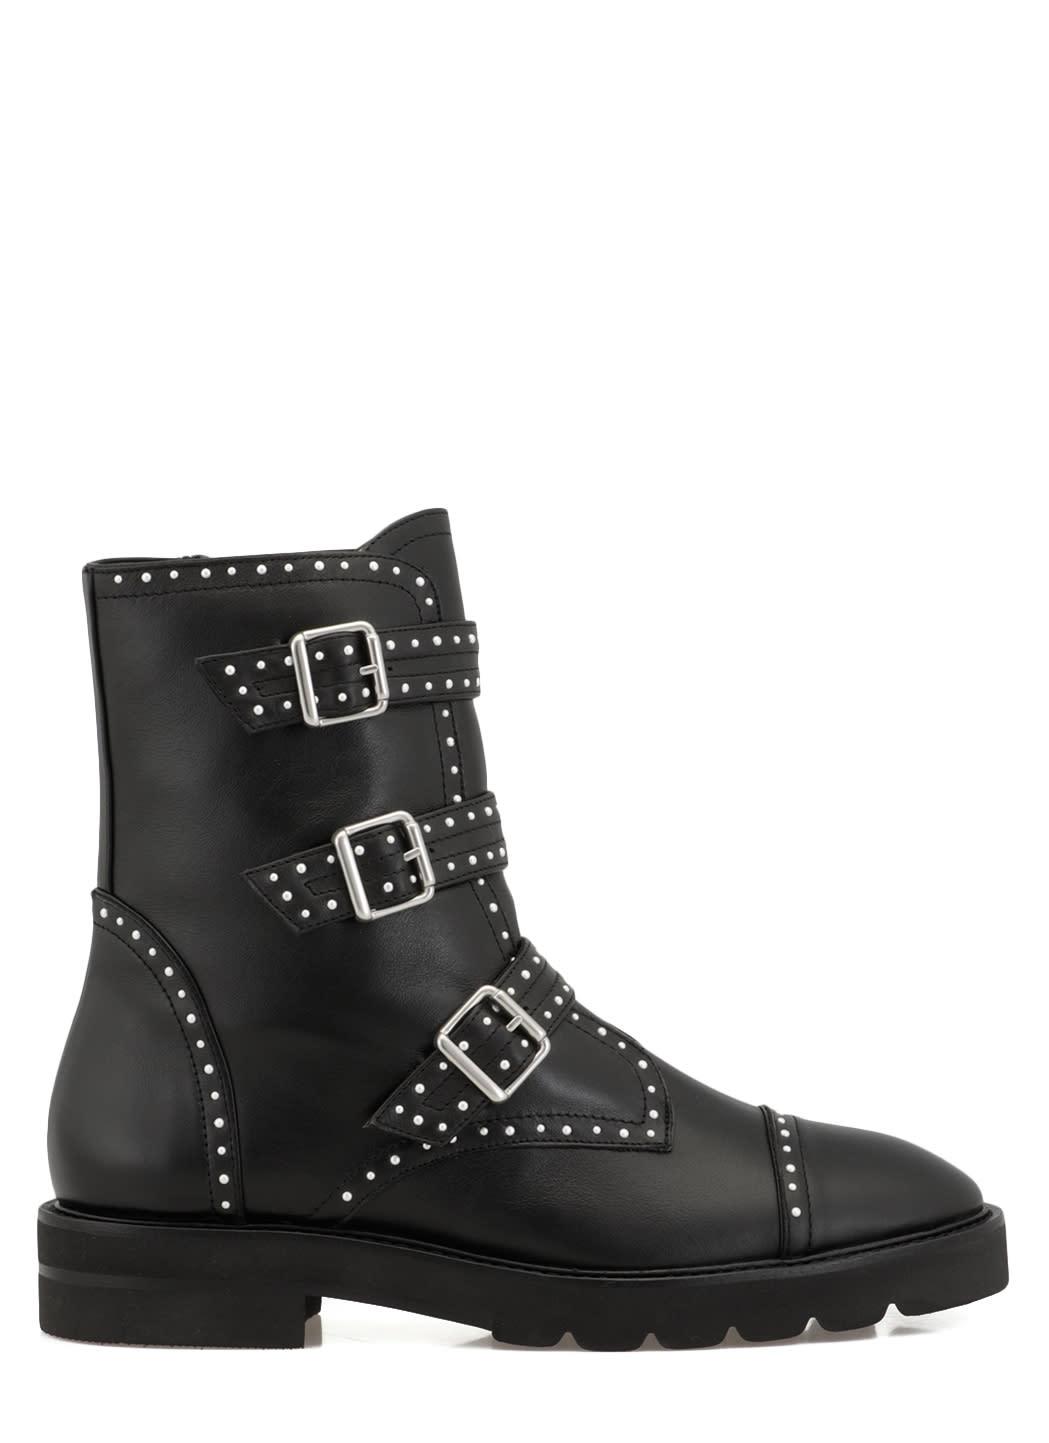 Buy Stuart Weitzman Jesse Lift Boot online, shop Stuart Weitzman shoes with free shipping